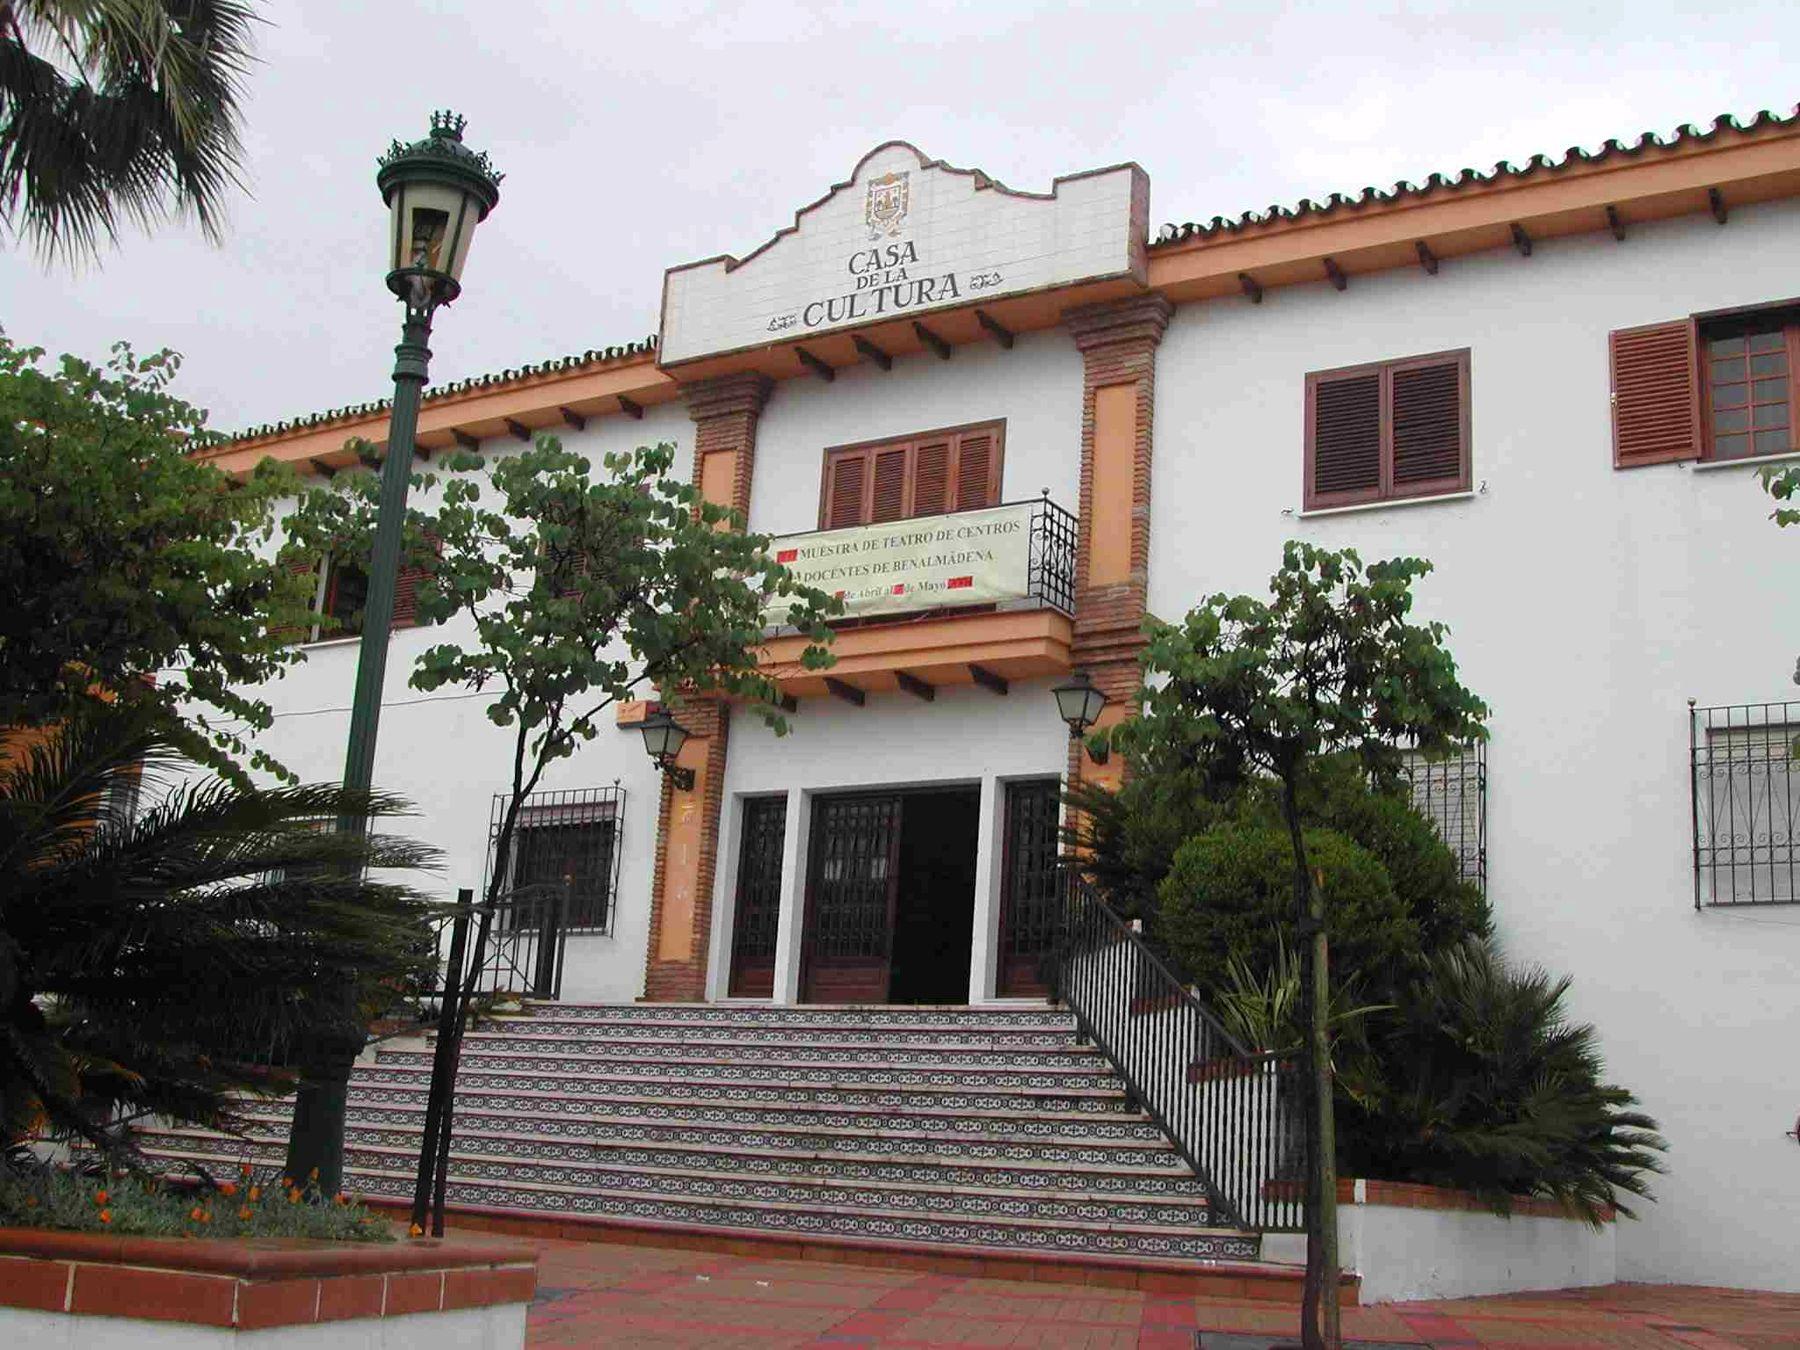 Escuela Municipal de Teatro